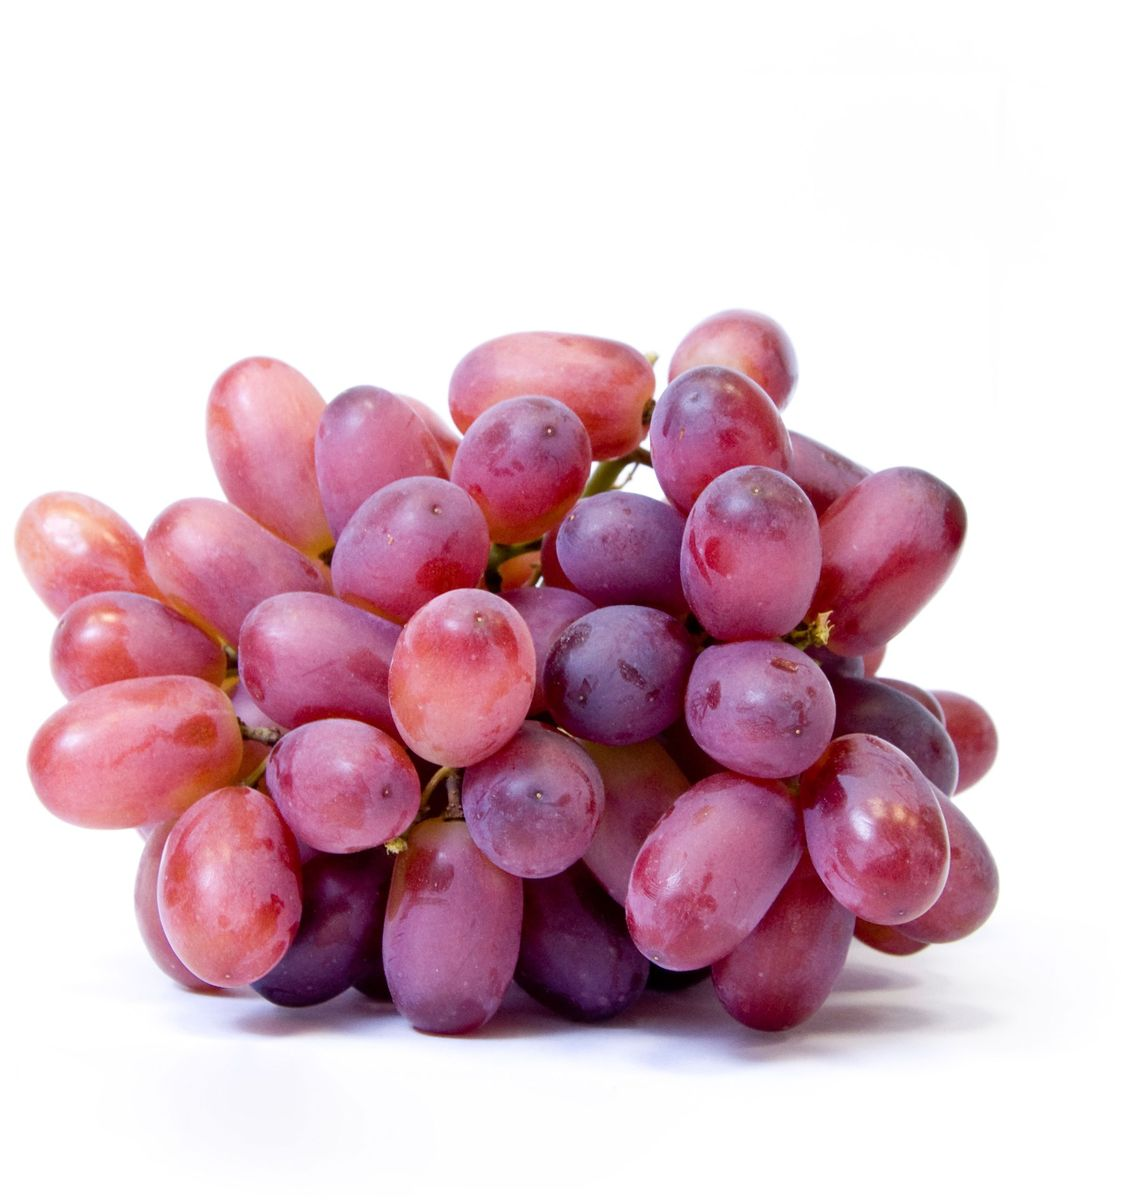 Виноград красный без косточек, 500 г виноград белый без косточек 500 г